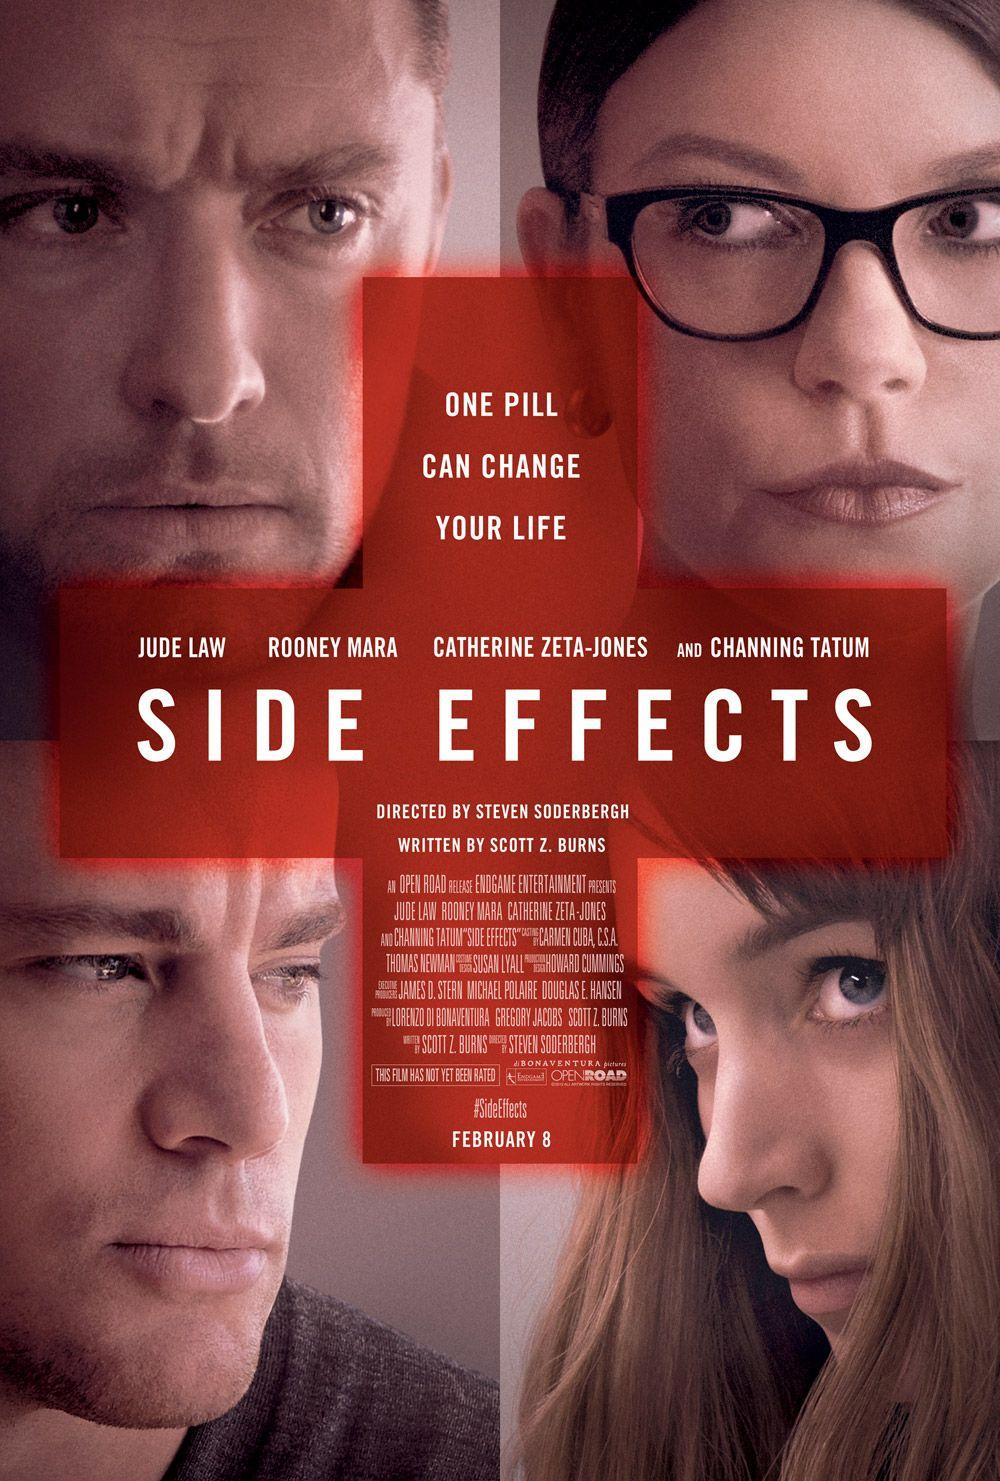 Side effects by Steve Martin Psycho Babble